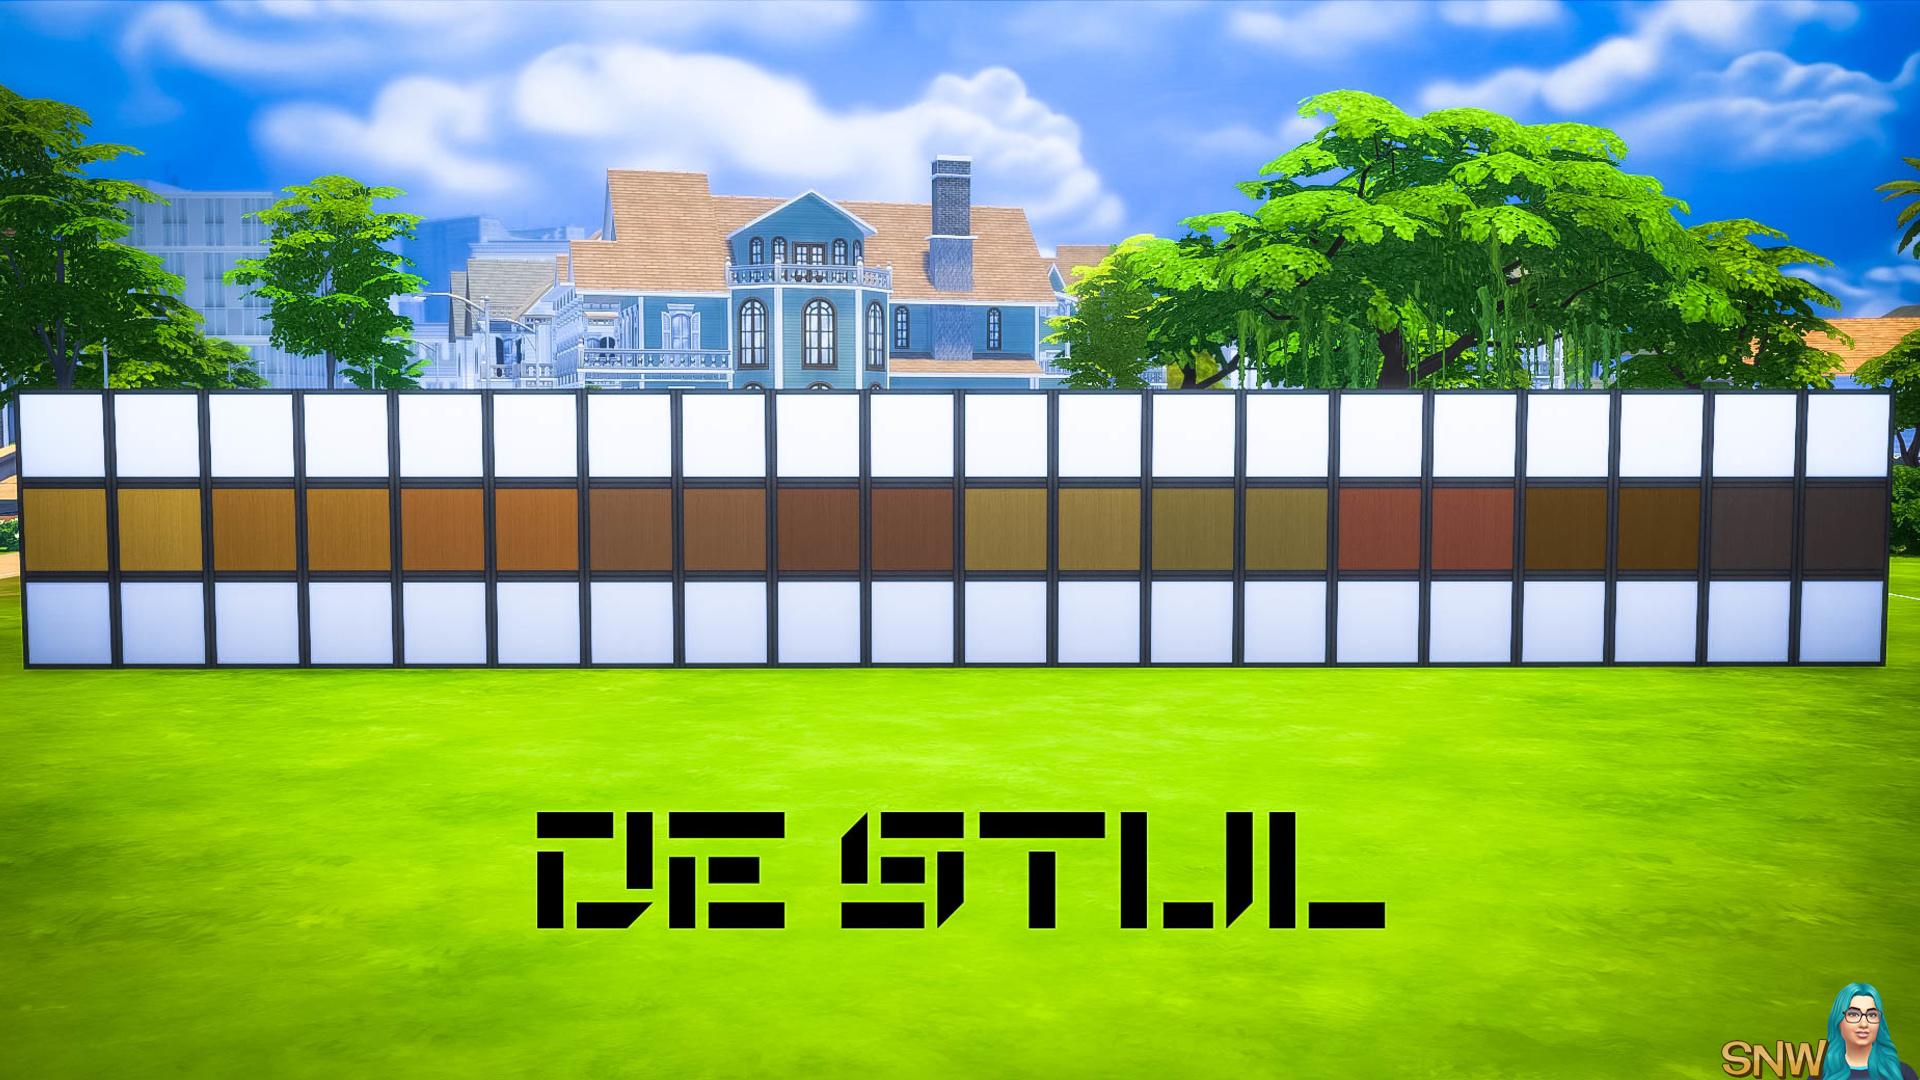 De Stijl Wooden Wall Panels Blocks (Middle) #11